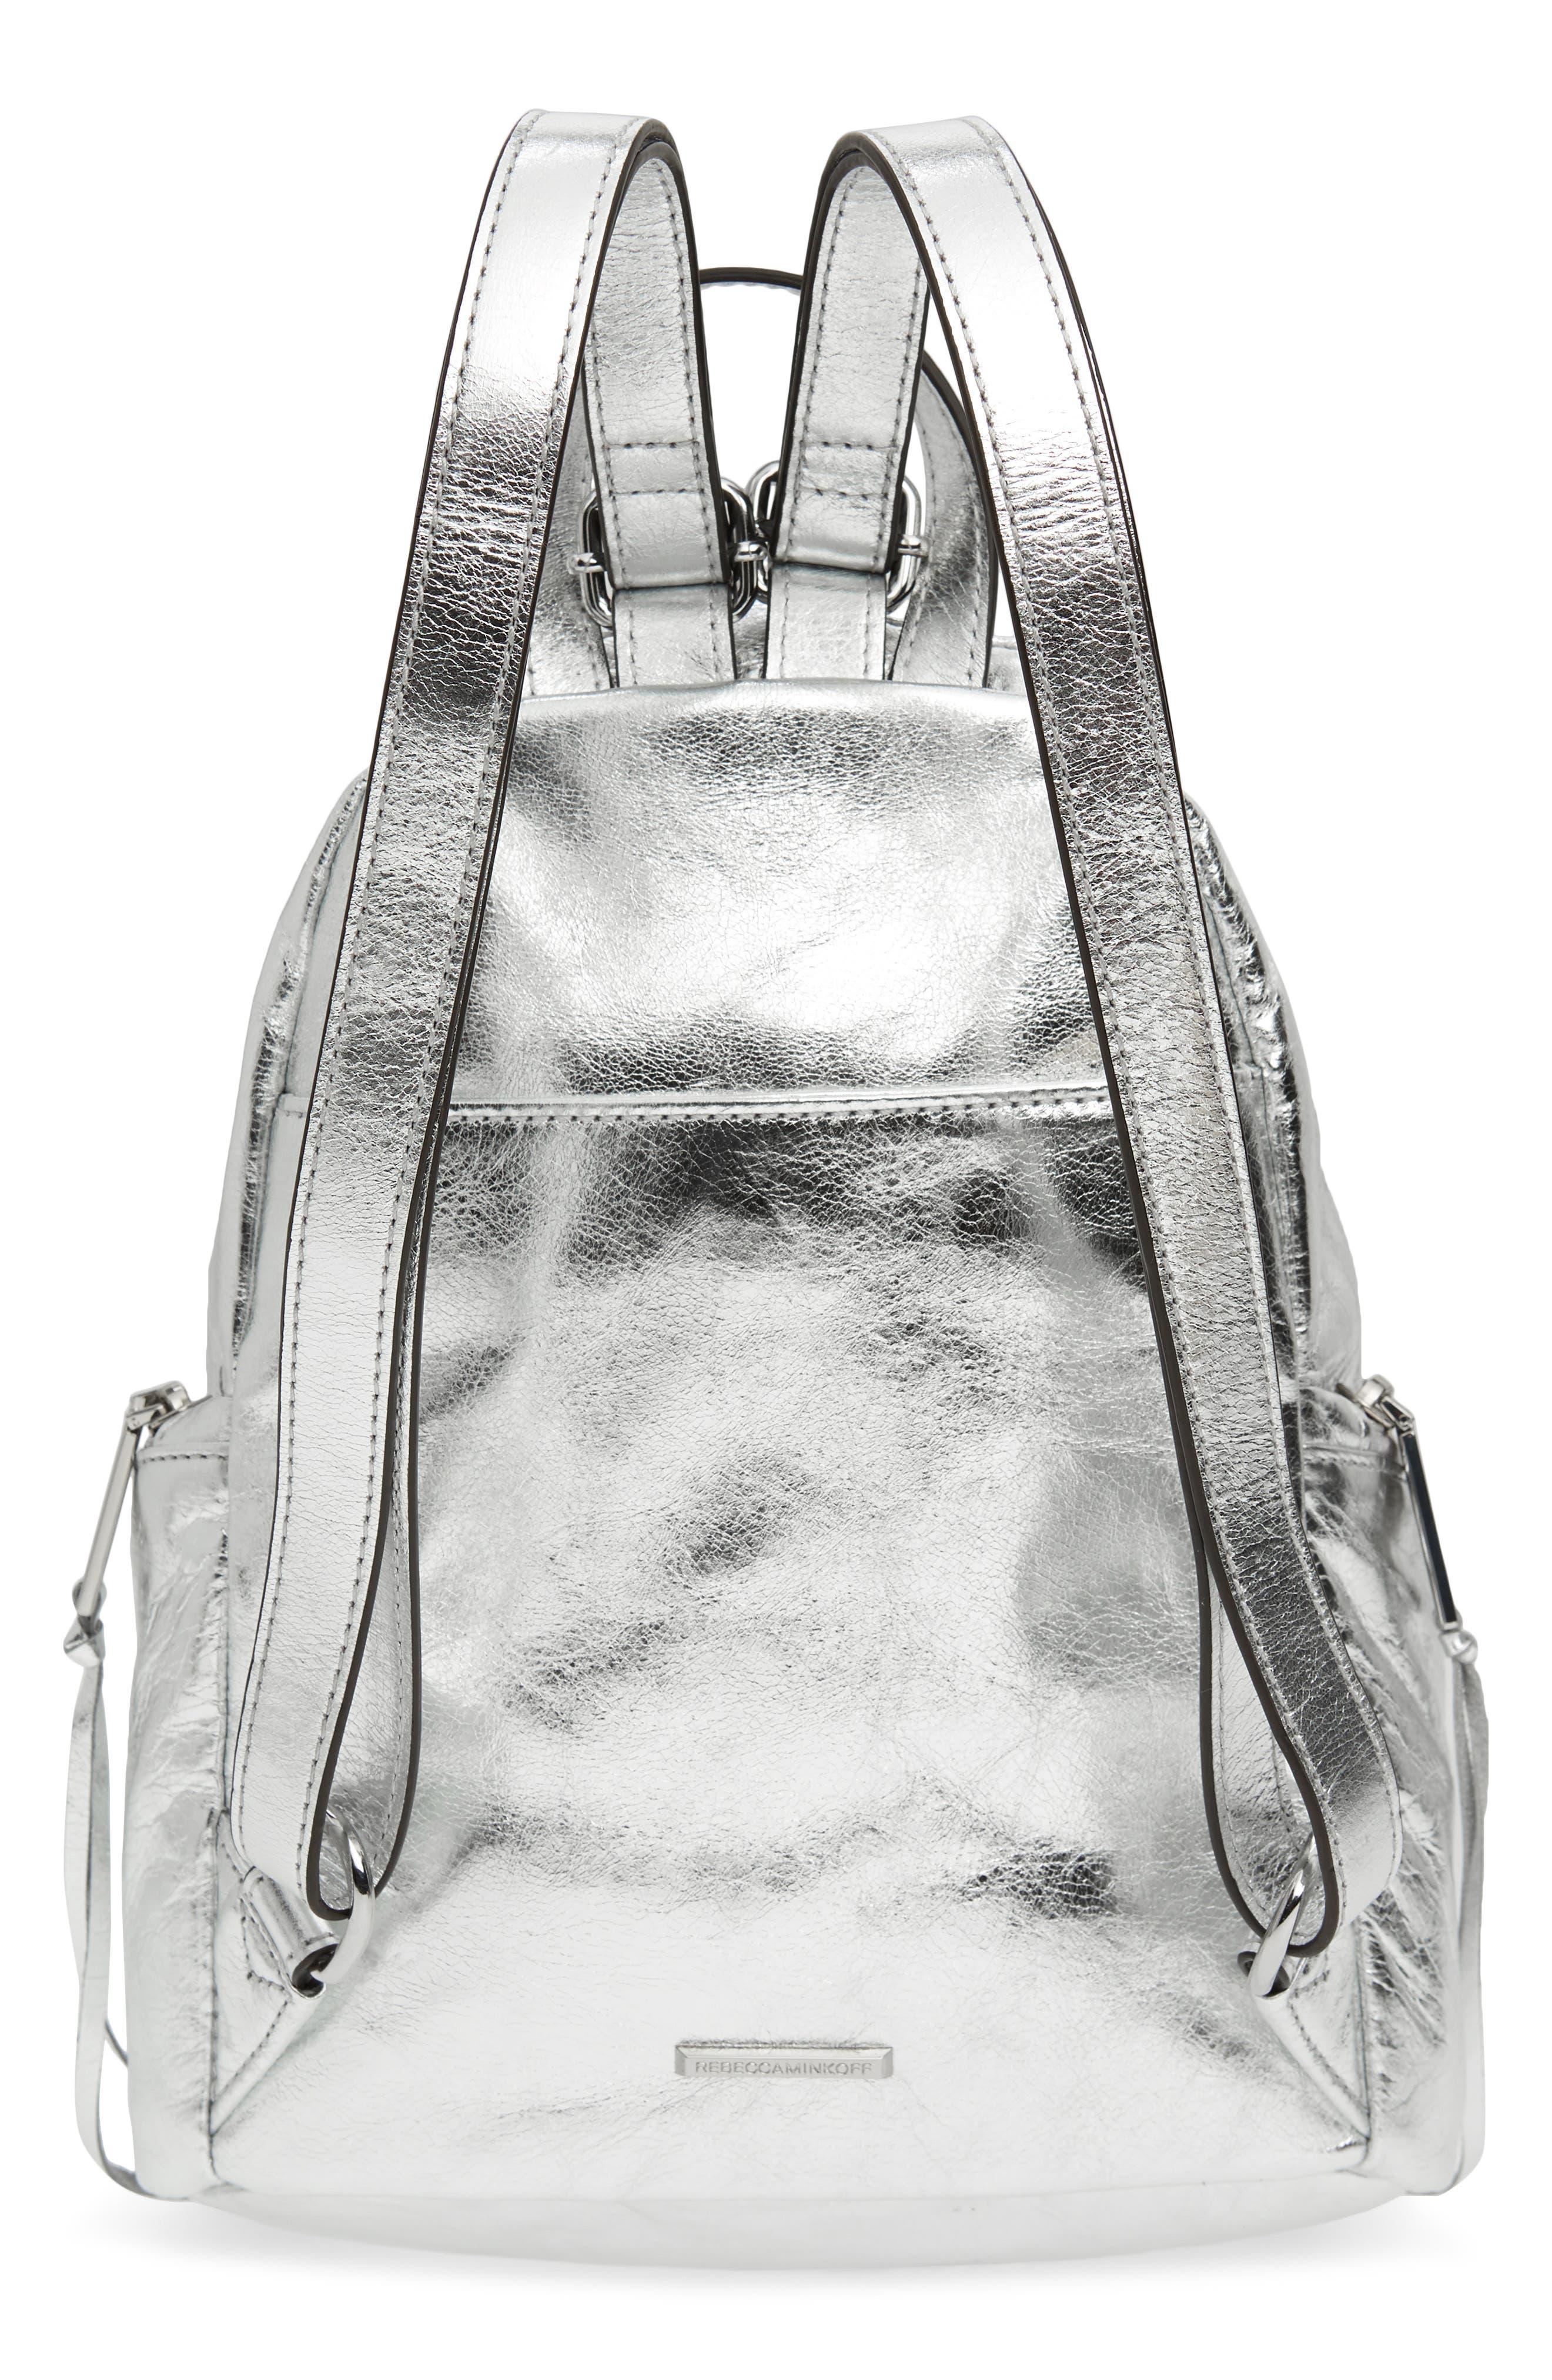 Medium Julian Leather Backpack,                             Alternate thumbnail 3, color,                             040